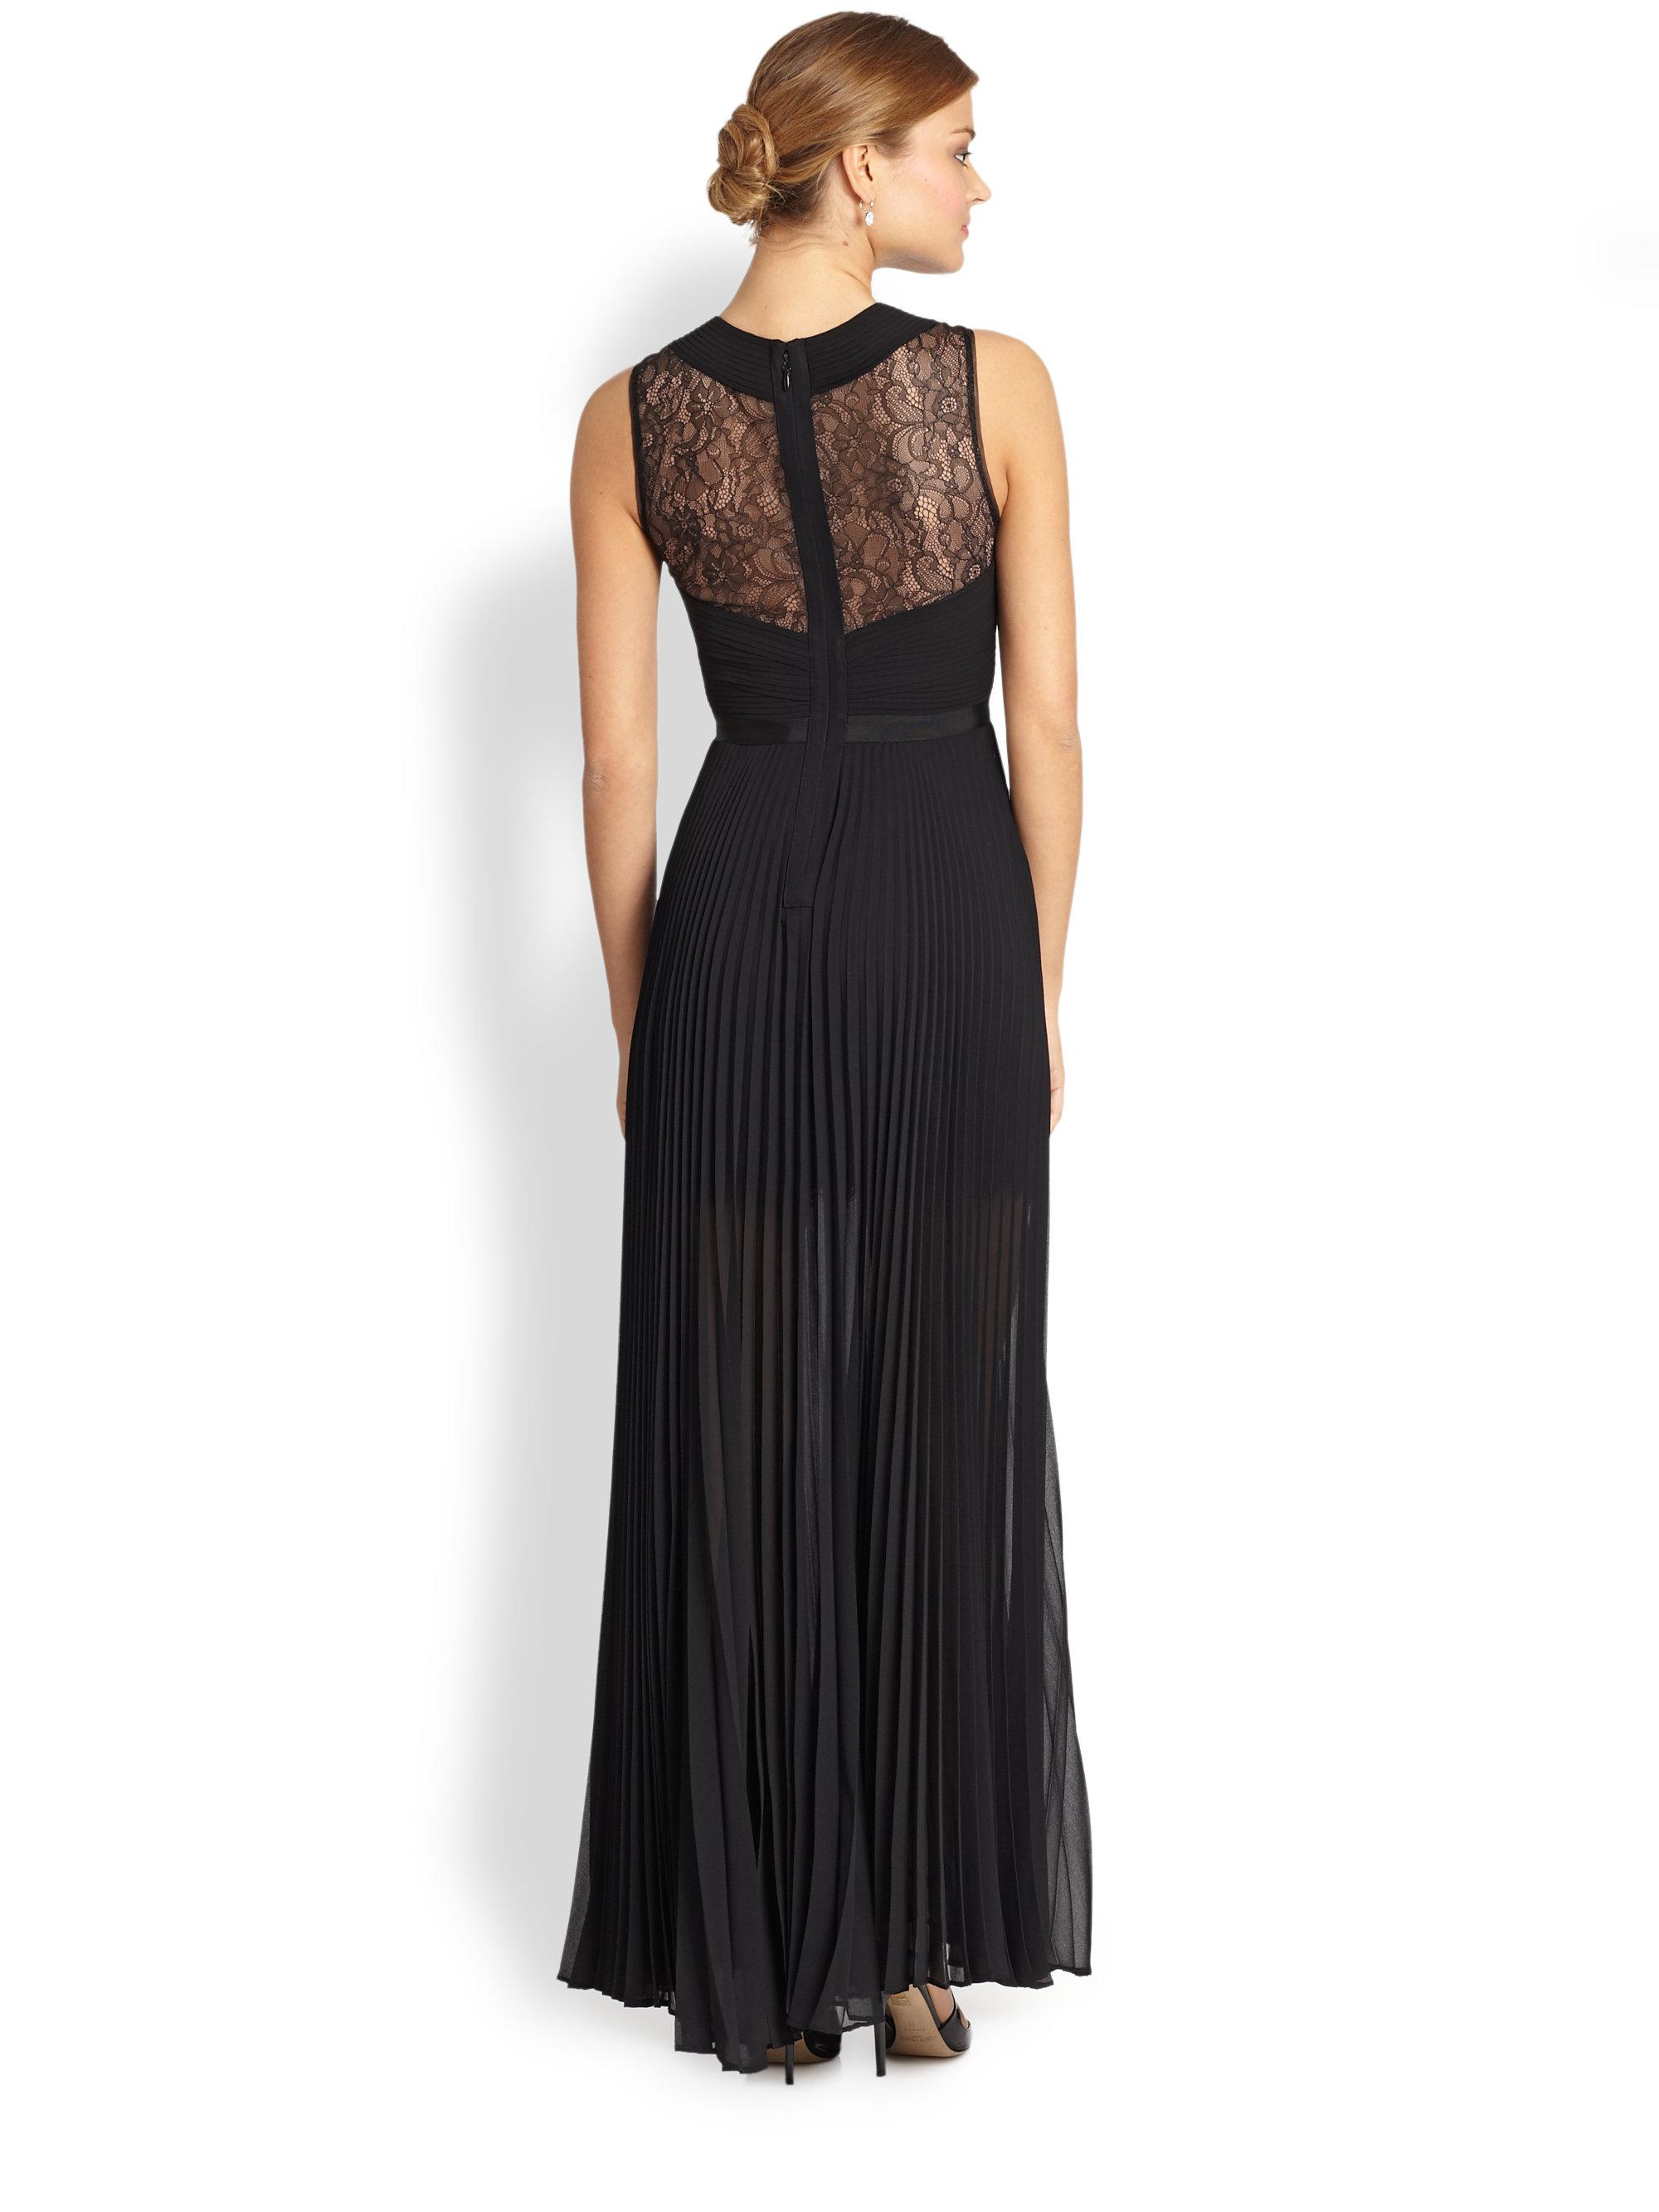 09cd0aad948b BCBGMAXAZRIA Caia Pleated Illusion Dress in Black - Lyst